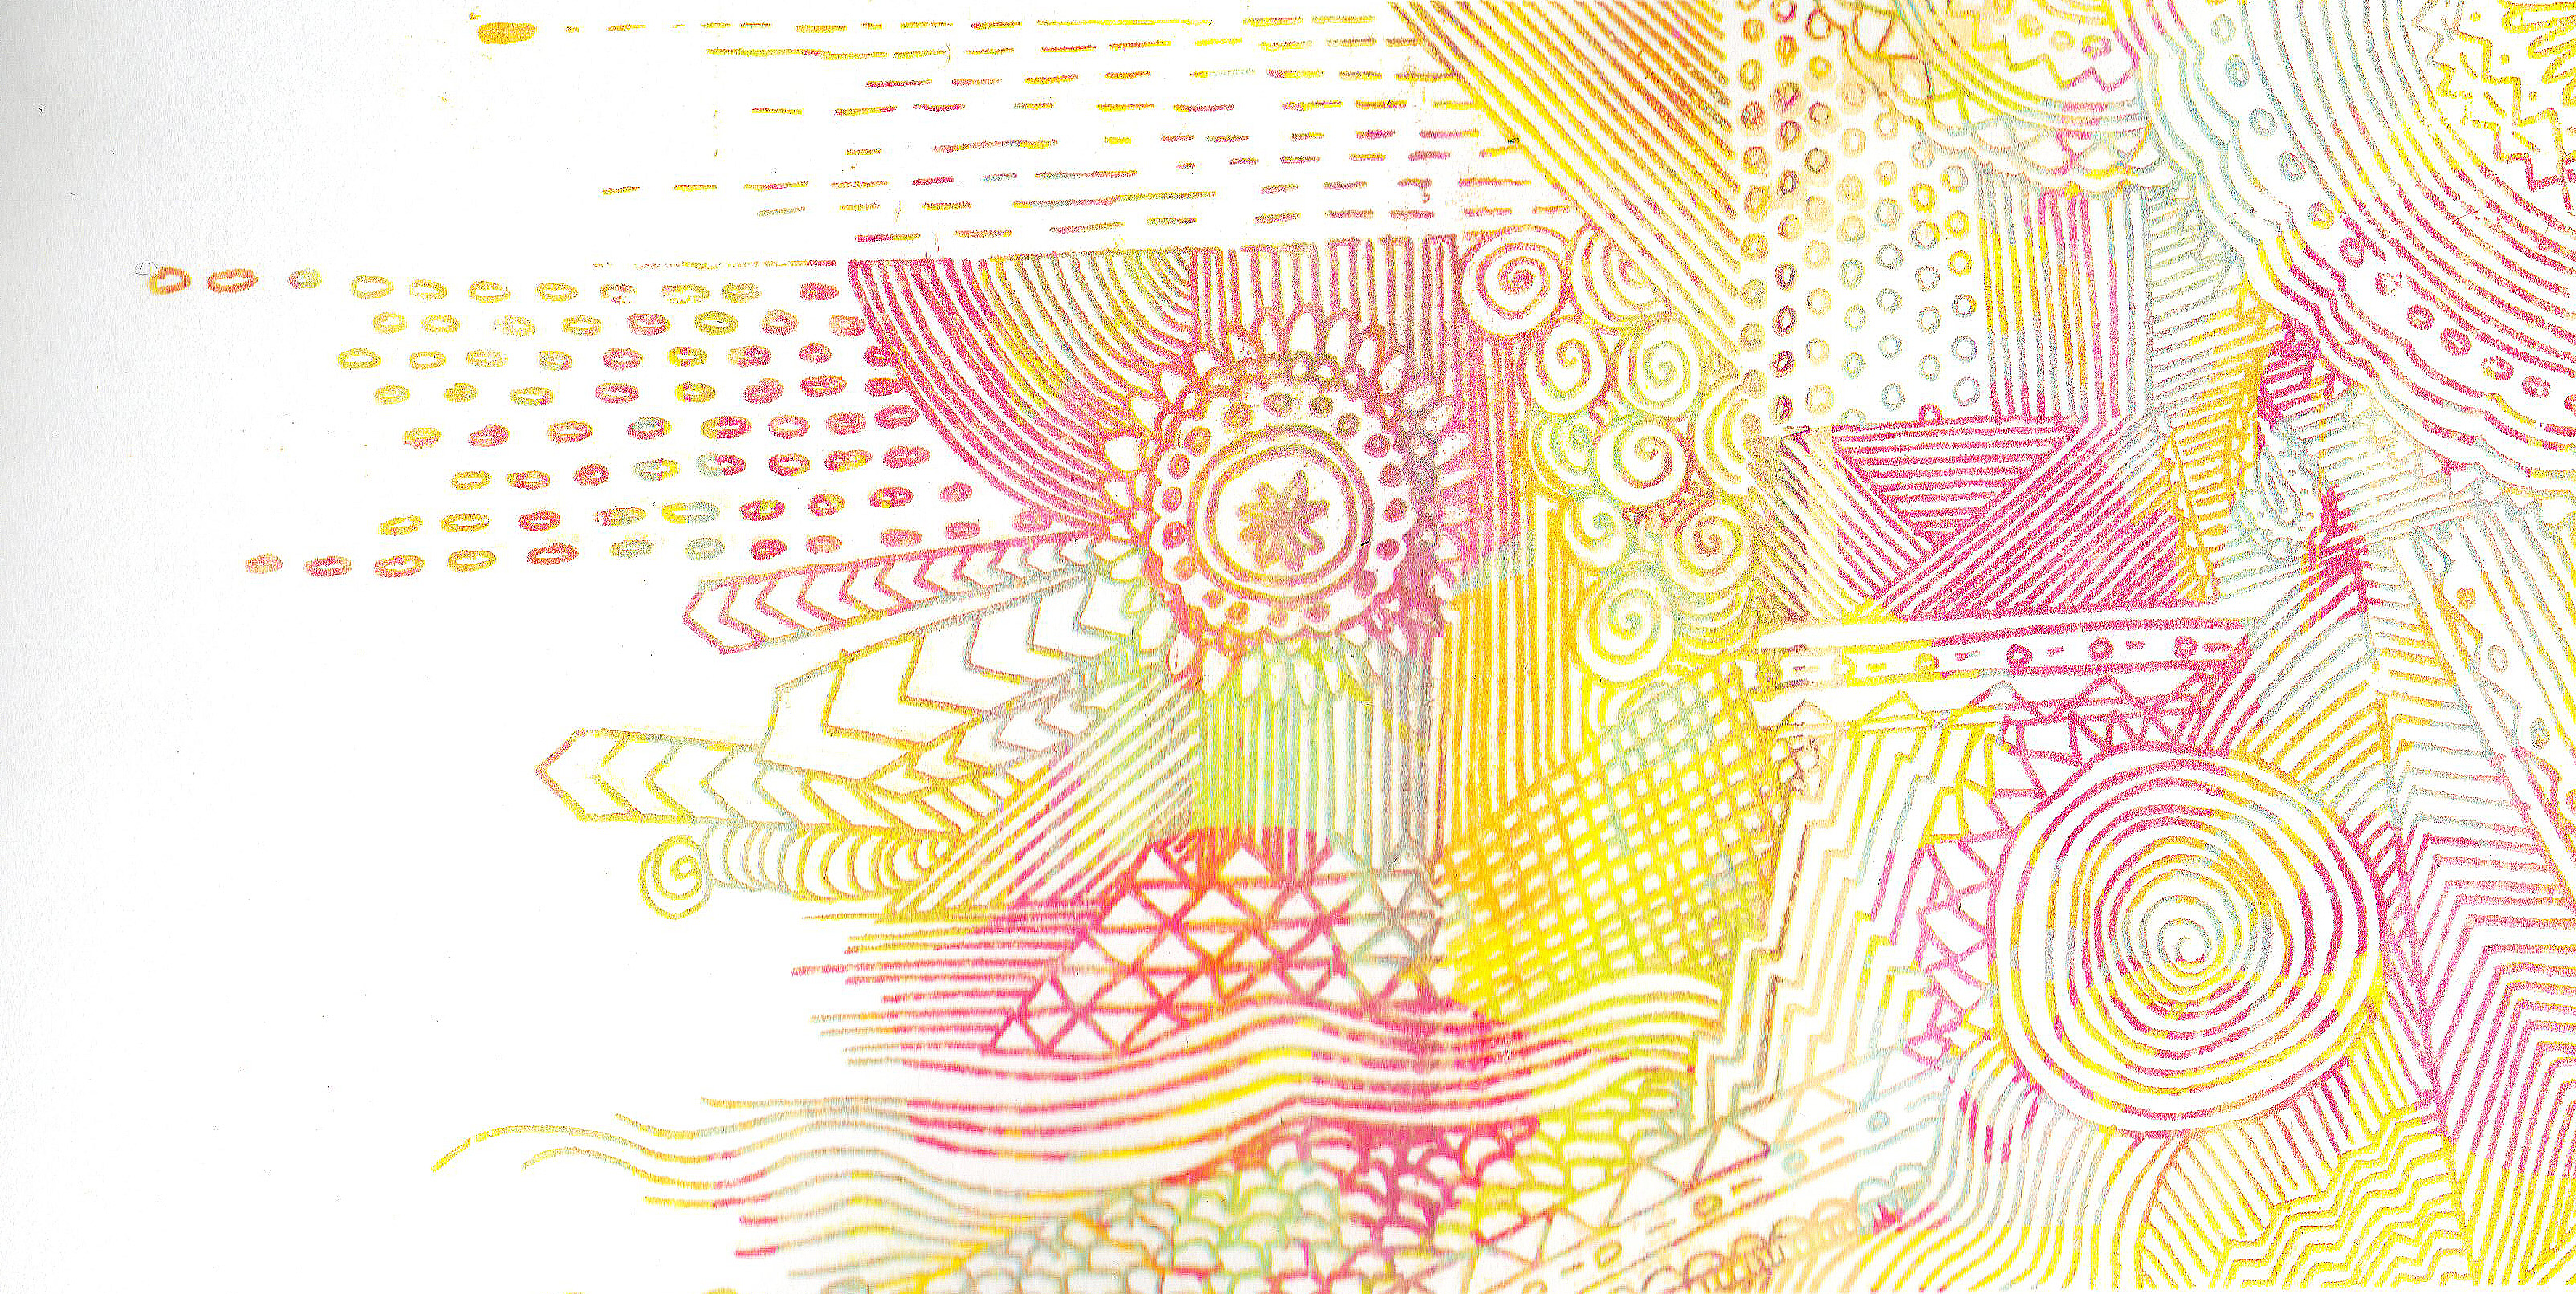 Screenprints of aztec background sarahmmortimer 3209x1612